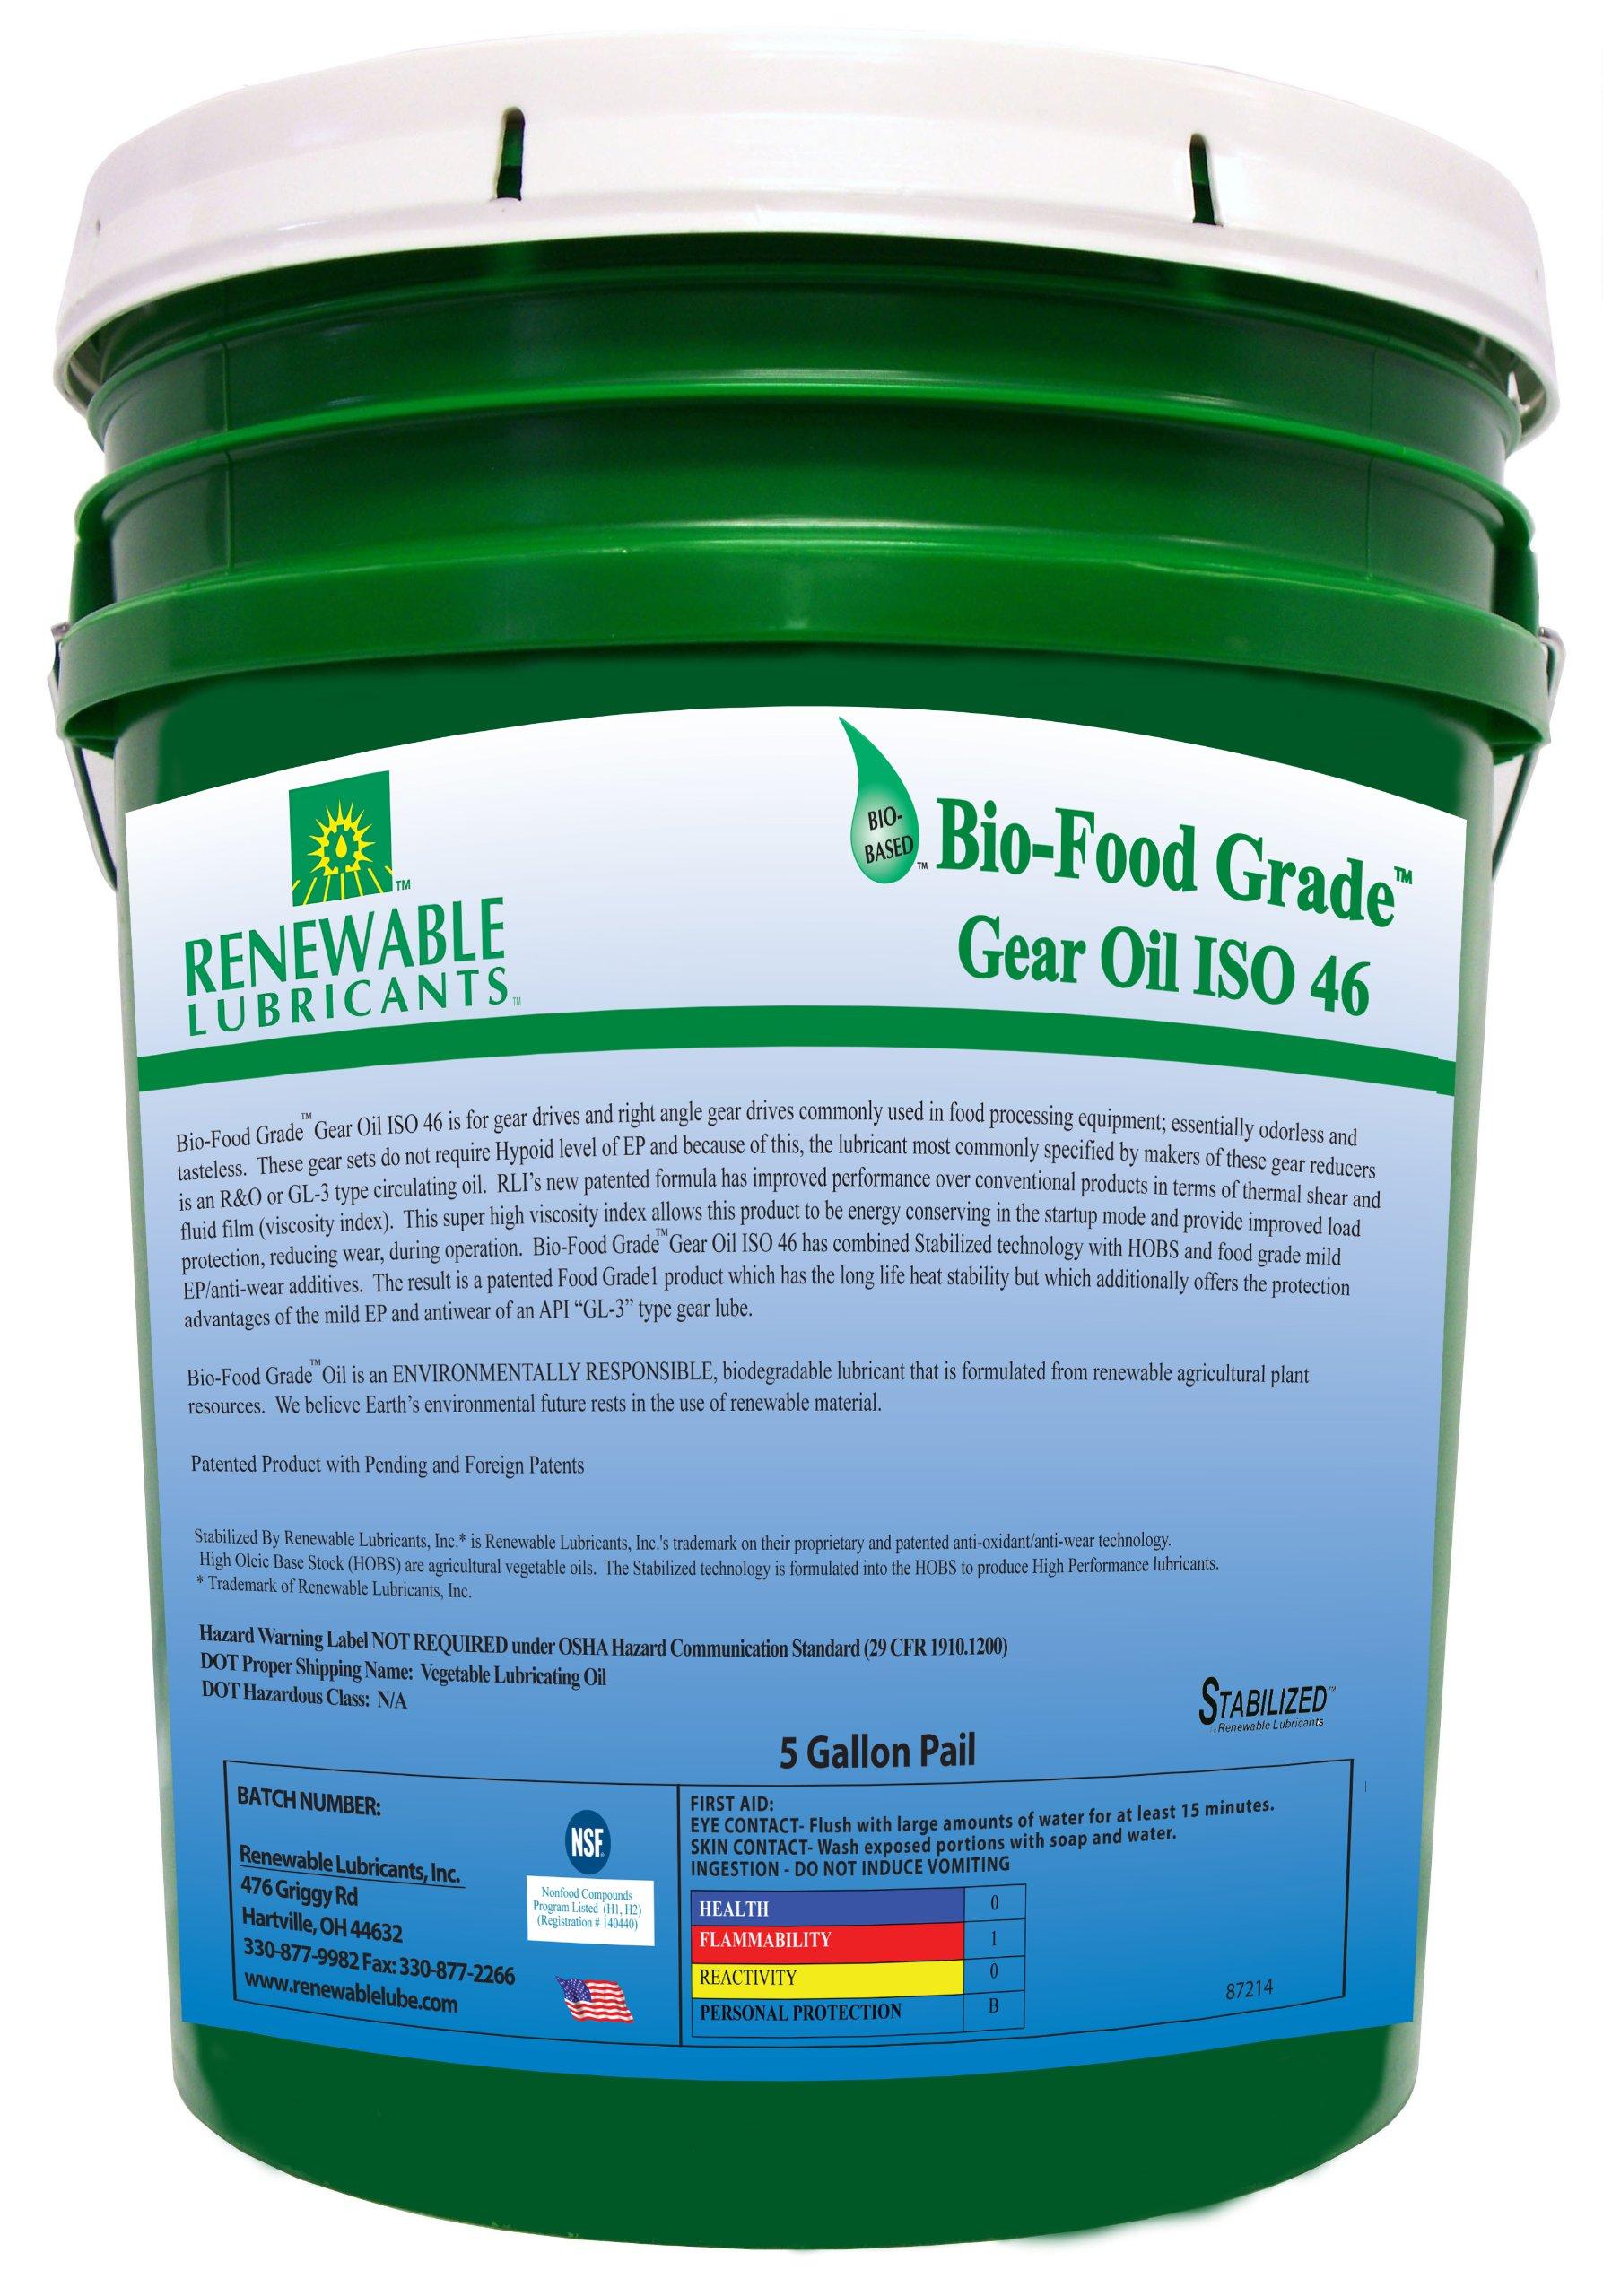 Renewable Lubricants Bio-Food Grade ISO 46 Gear Oil, 5 Gallon Pail by Renewable Lubricants